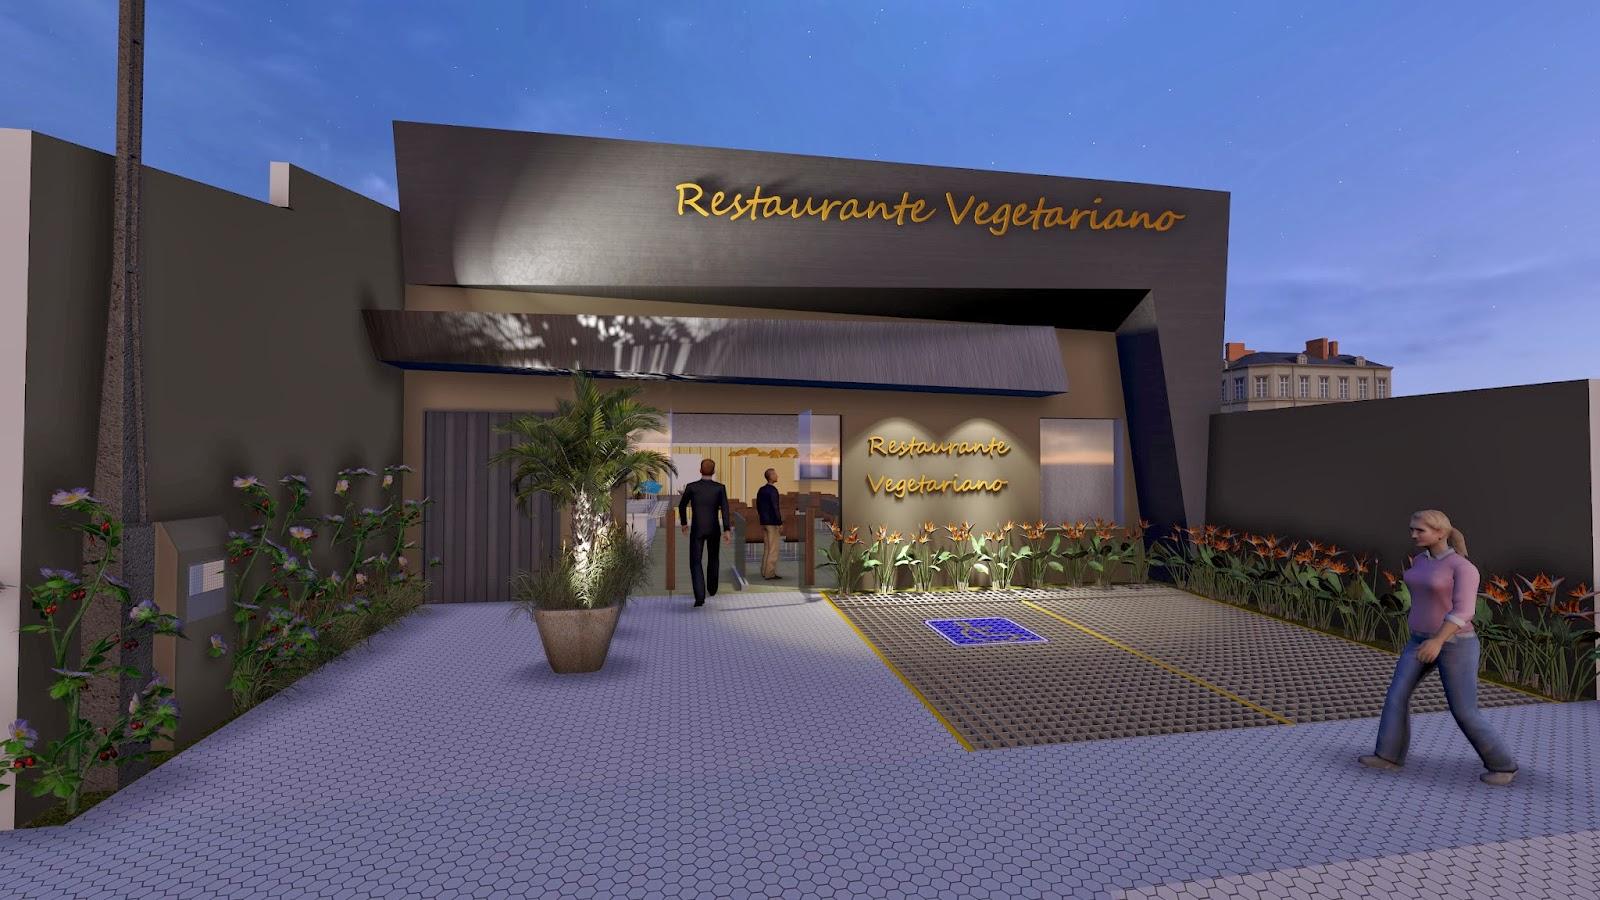 Kedson barbero arquitetura e urbanismo fachada for Fachada para restaurante